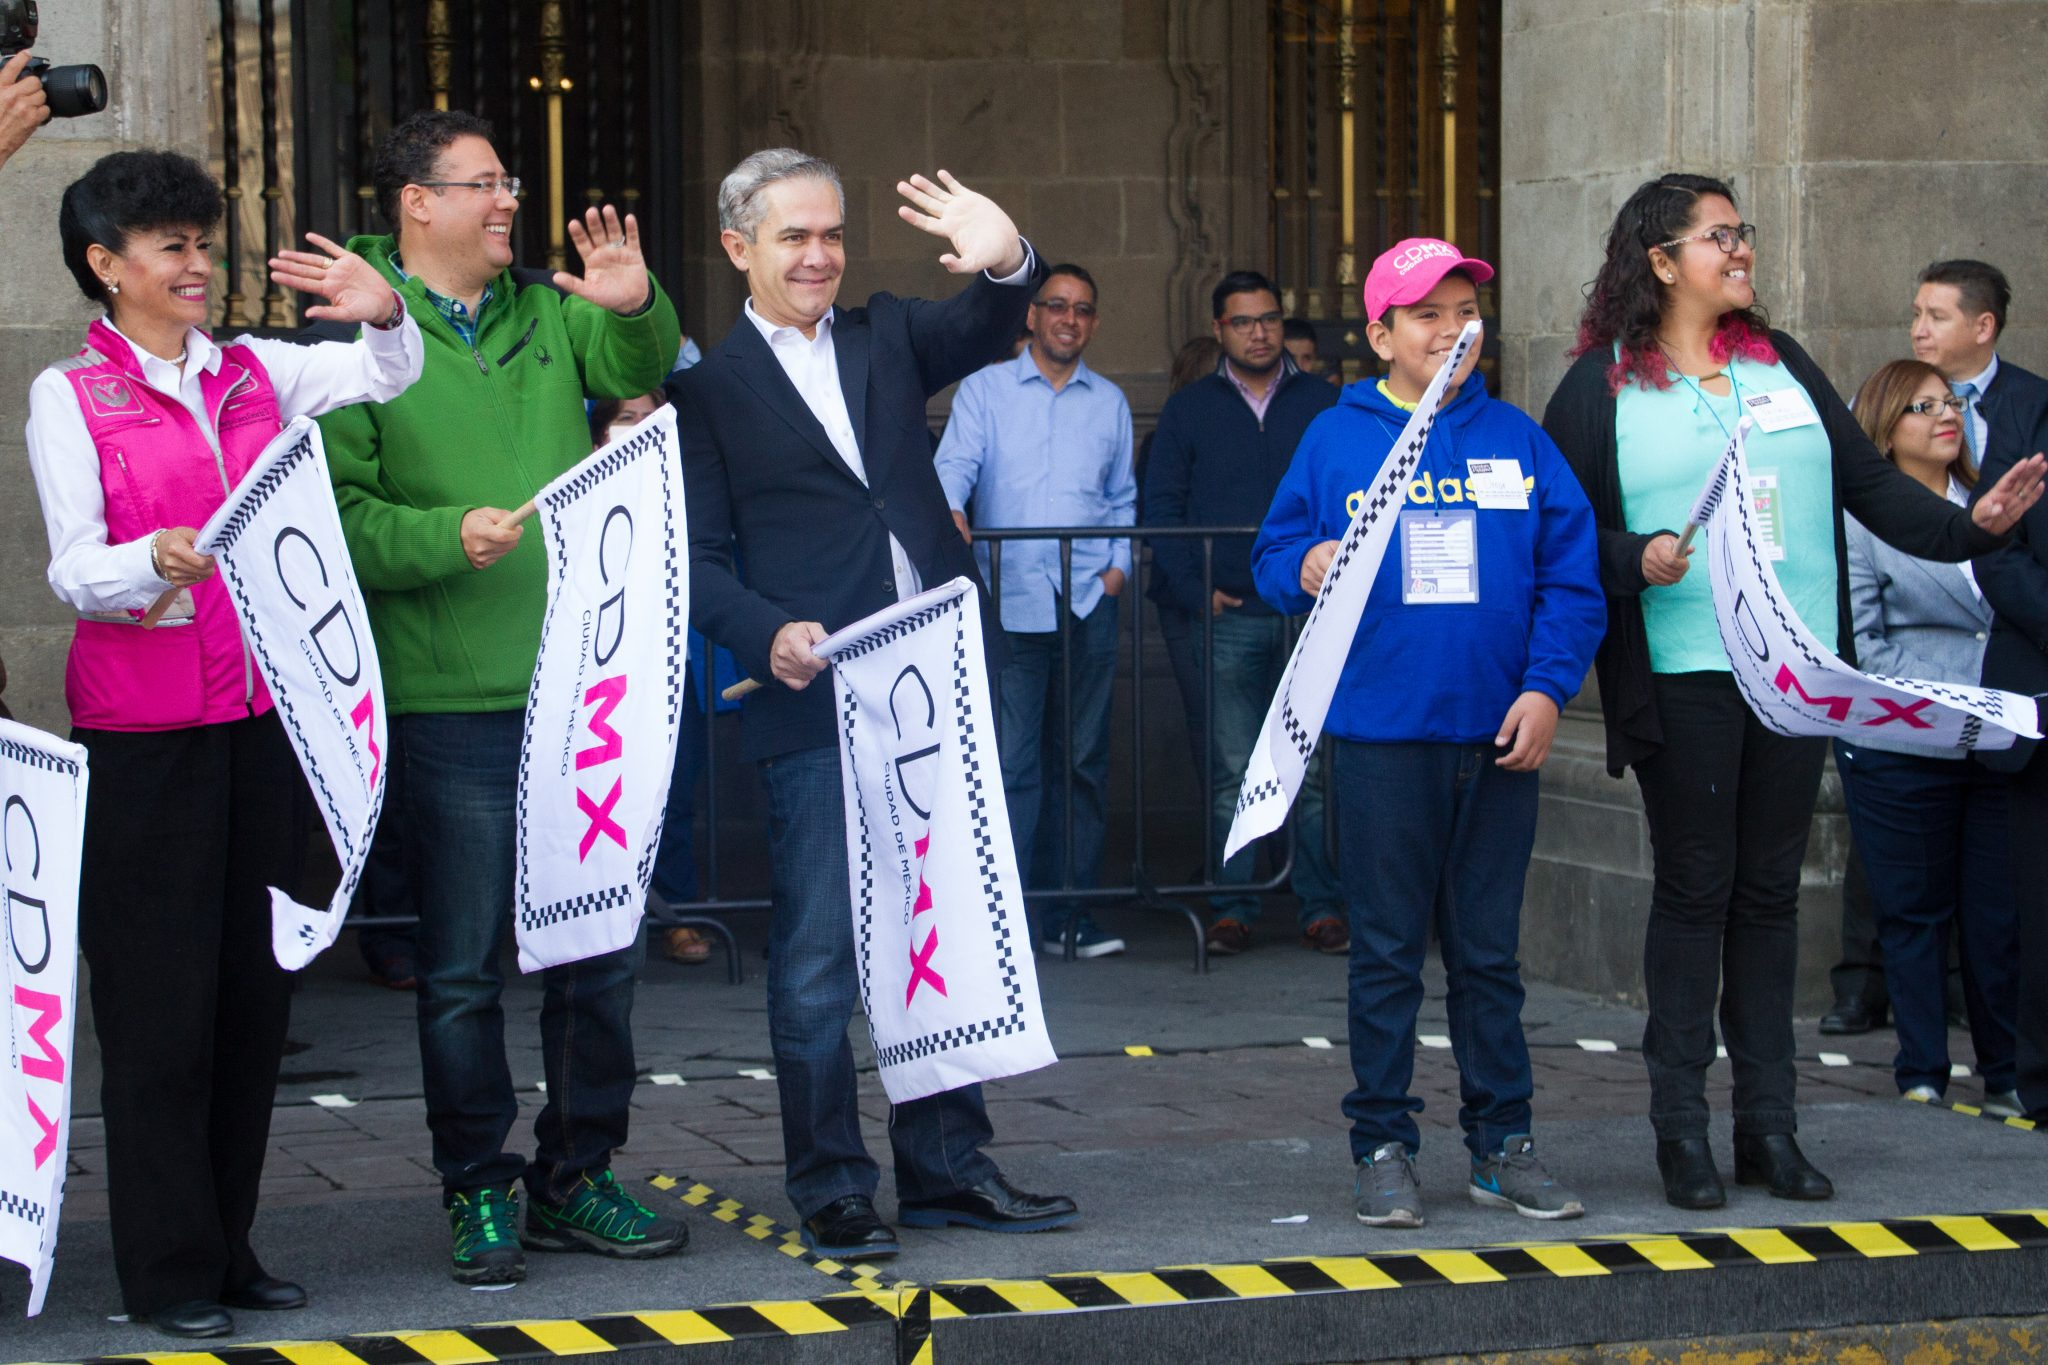 Gustavo Madero no impugnará candidatura de Mancera a Senado